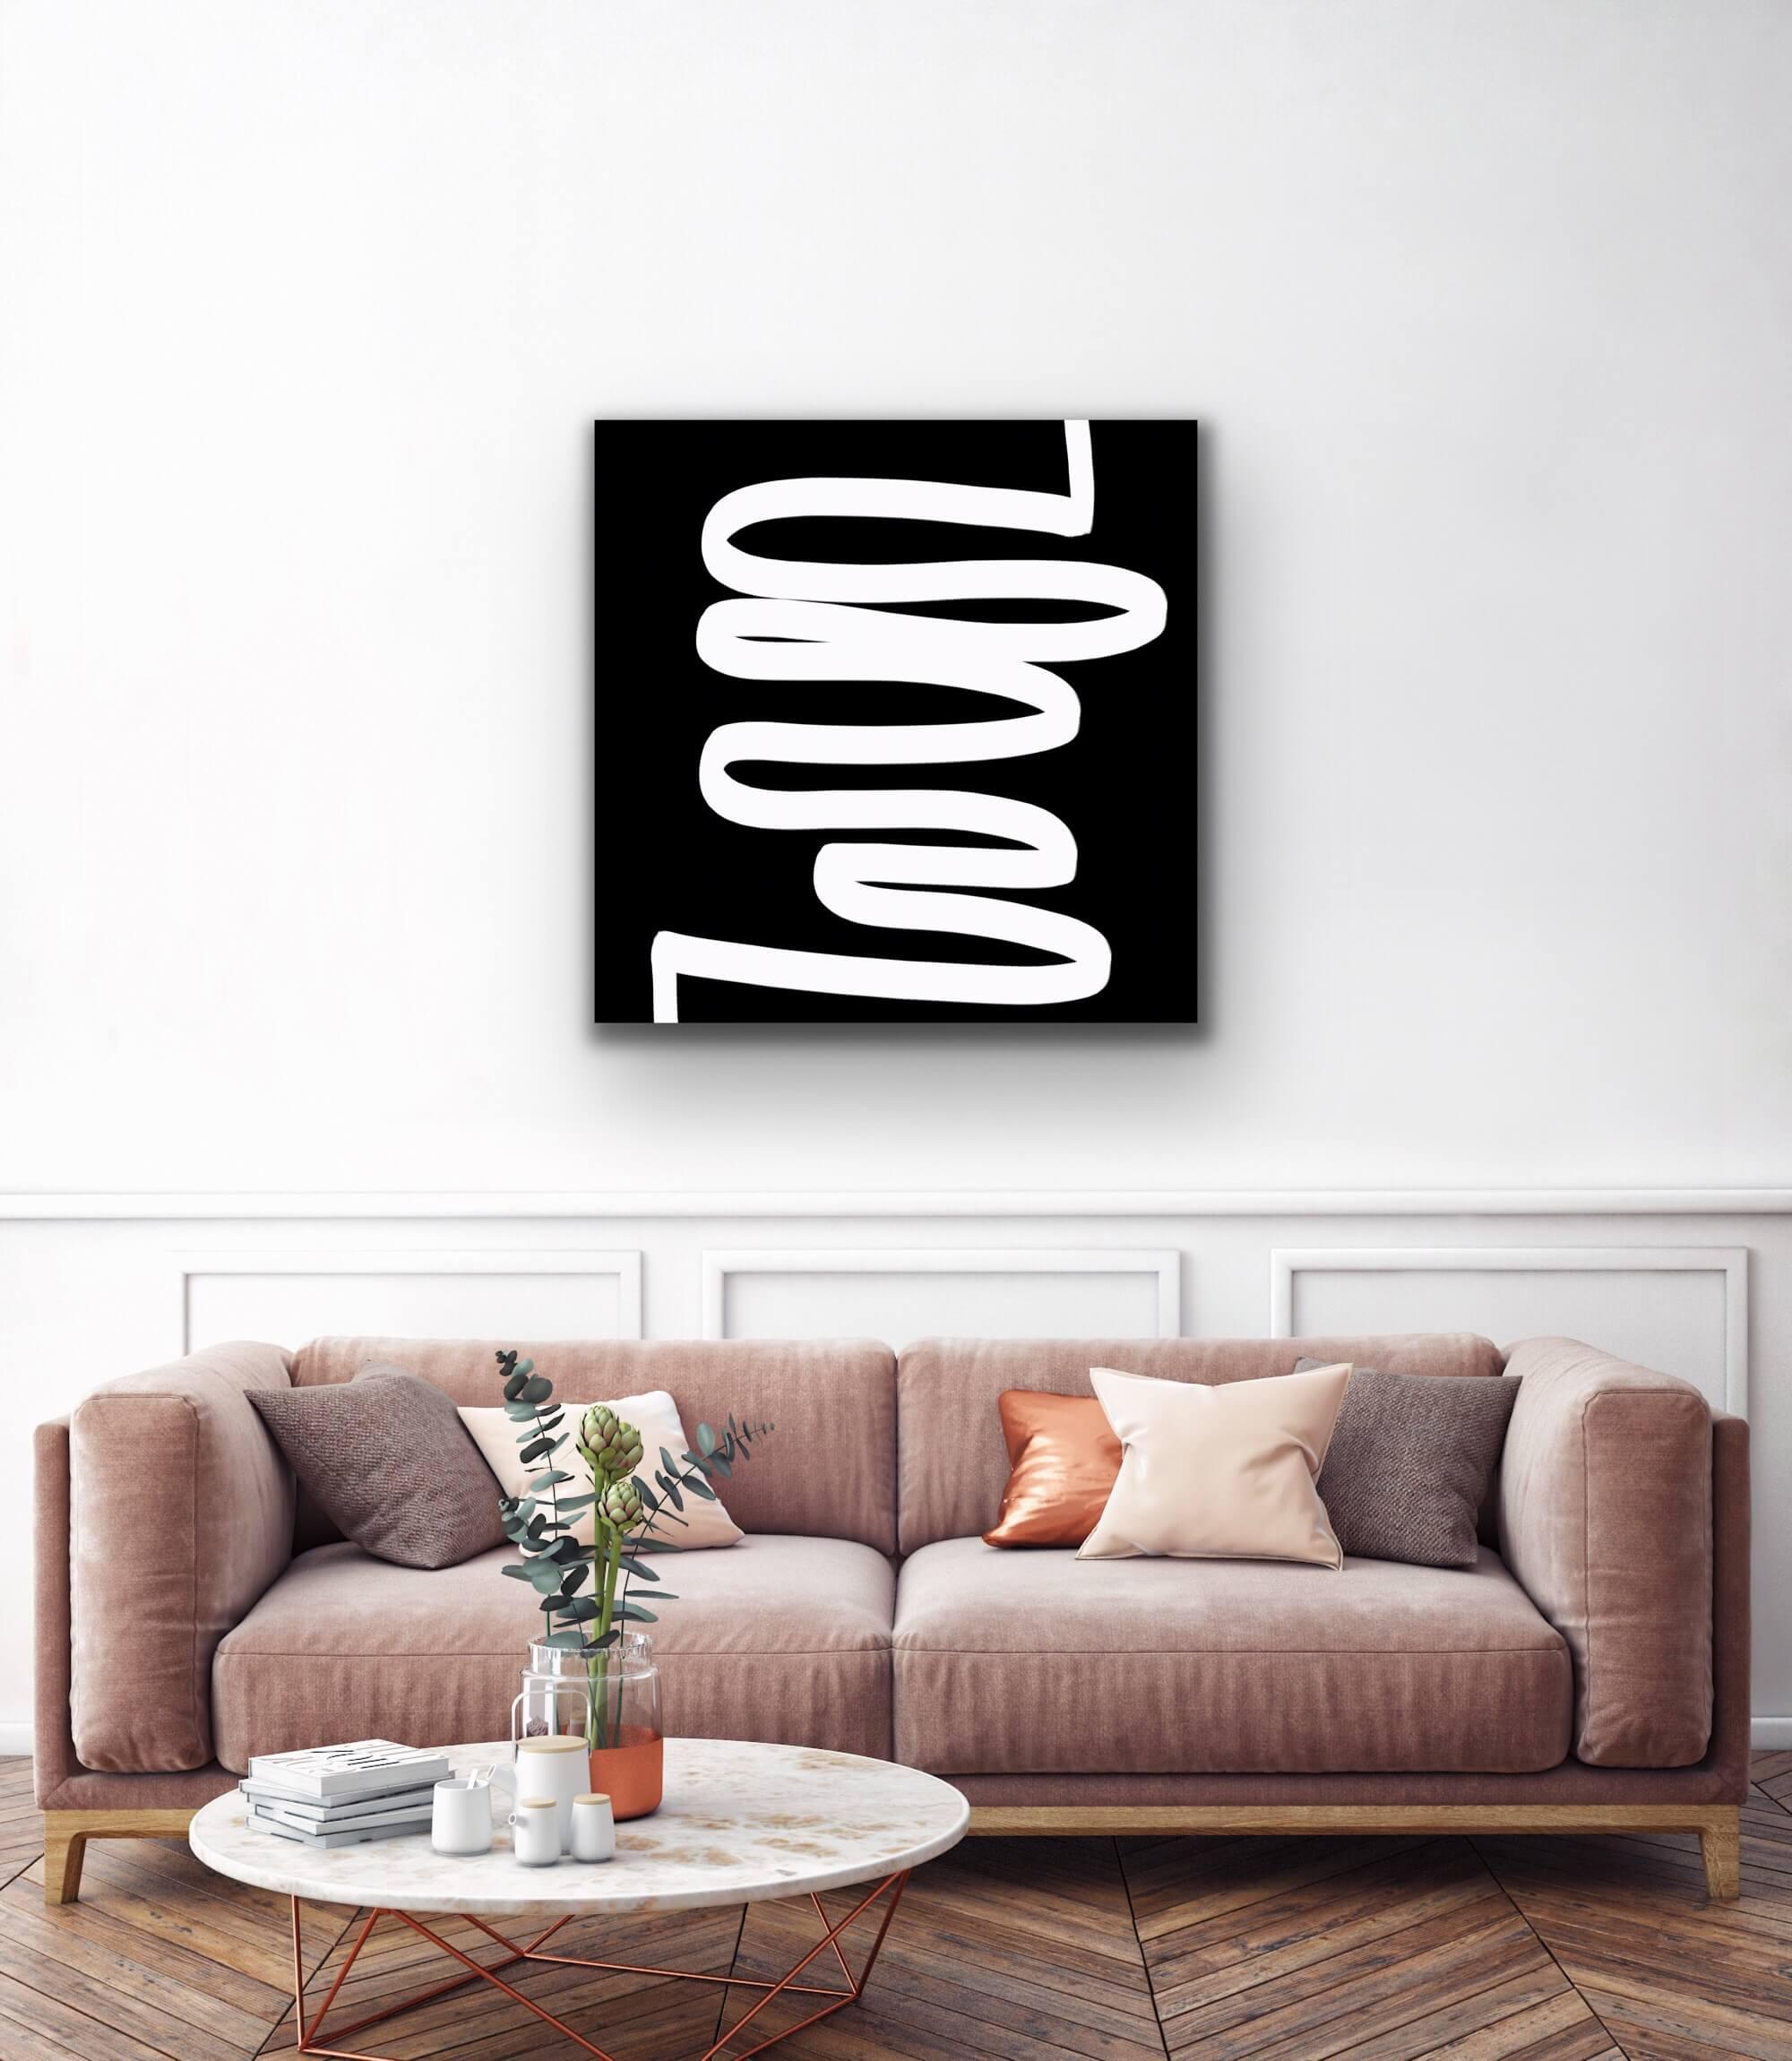 essentials glas print affordable art portfolio digital drawing Petronilla Hohenwarter interior design